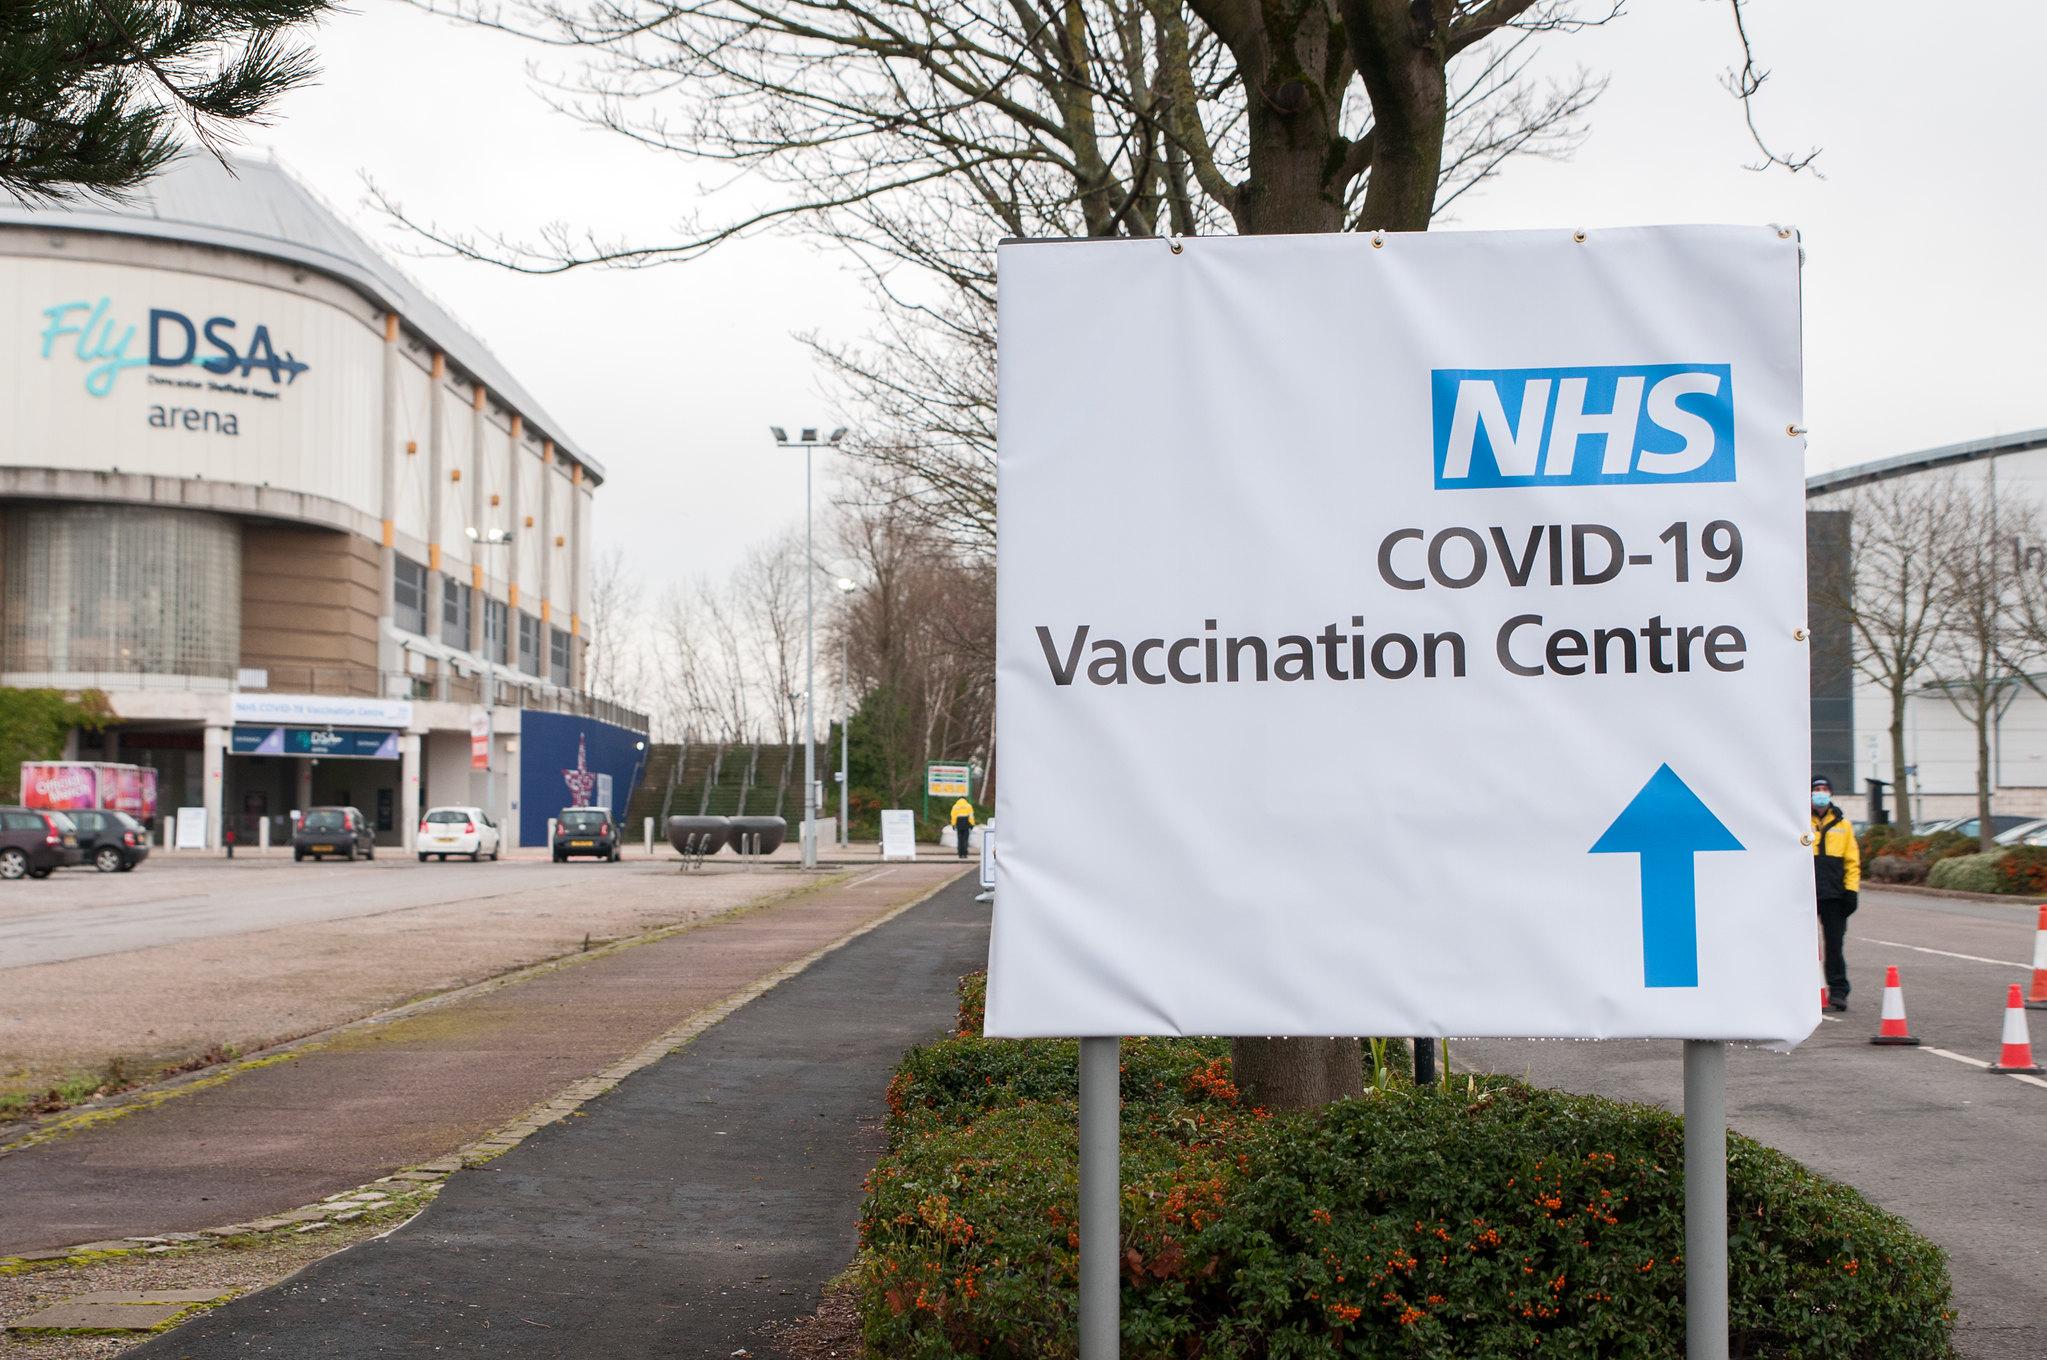 TUC เผยนายจ้างในอังกฤษให้ พนง. หยุดงานจ่ายค่าจ้างฉีดวัคซีน COVID-19 แค่ 45%